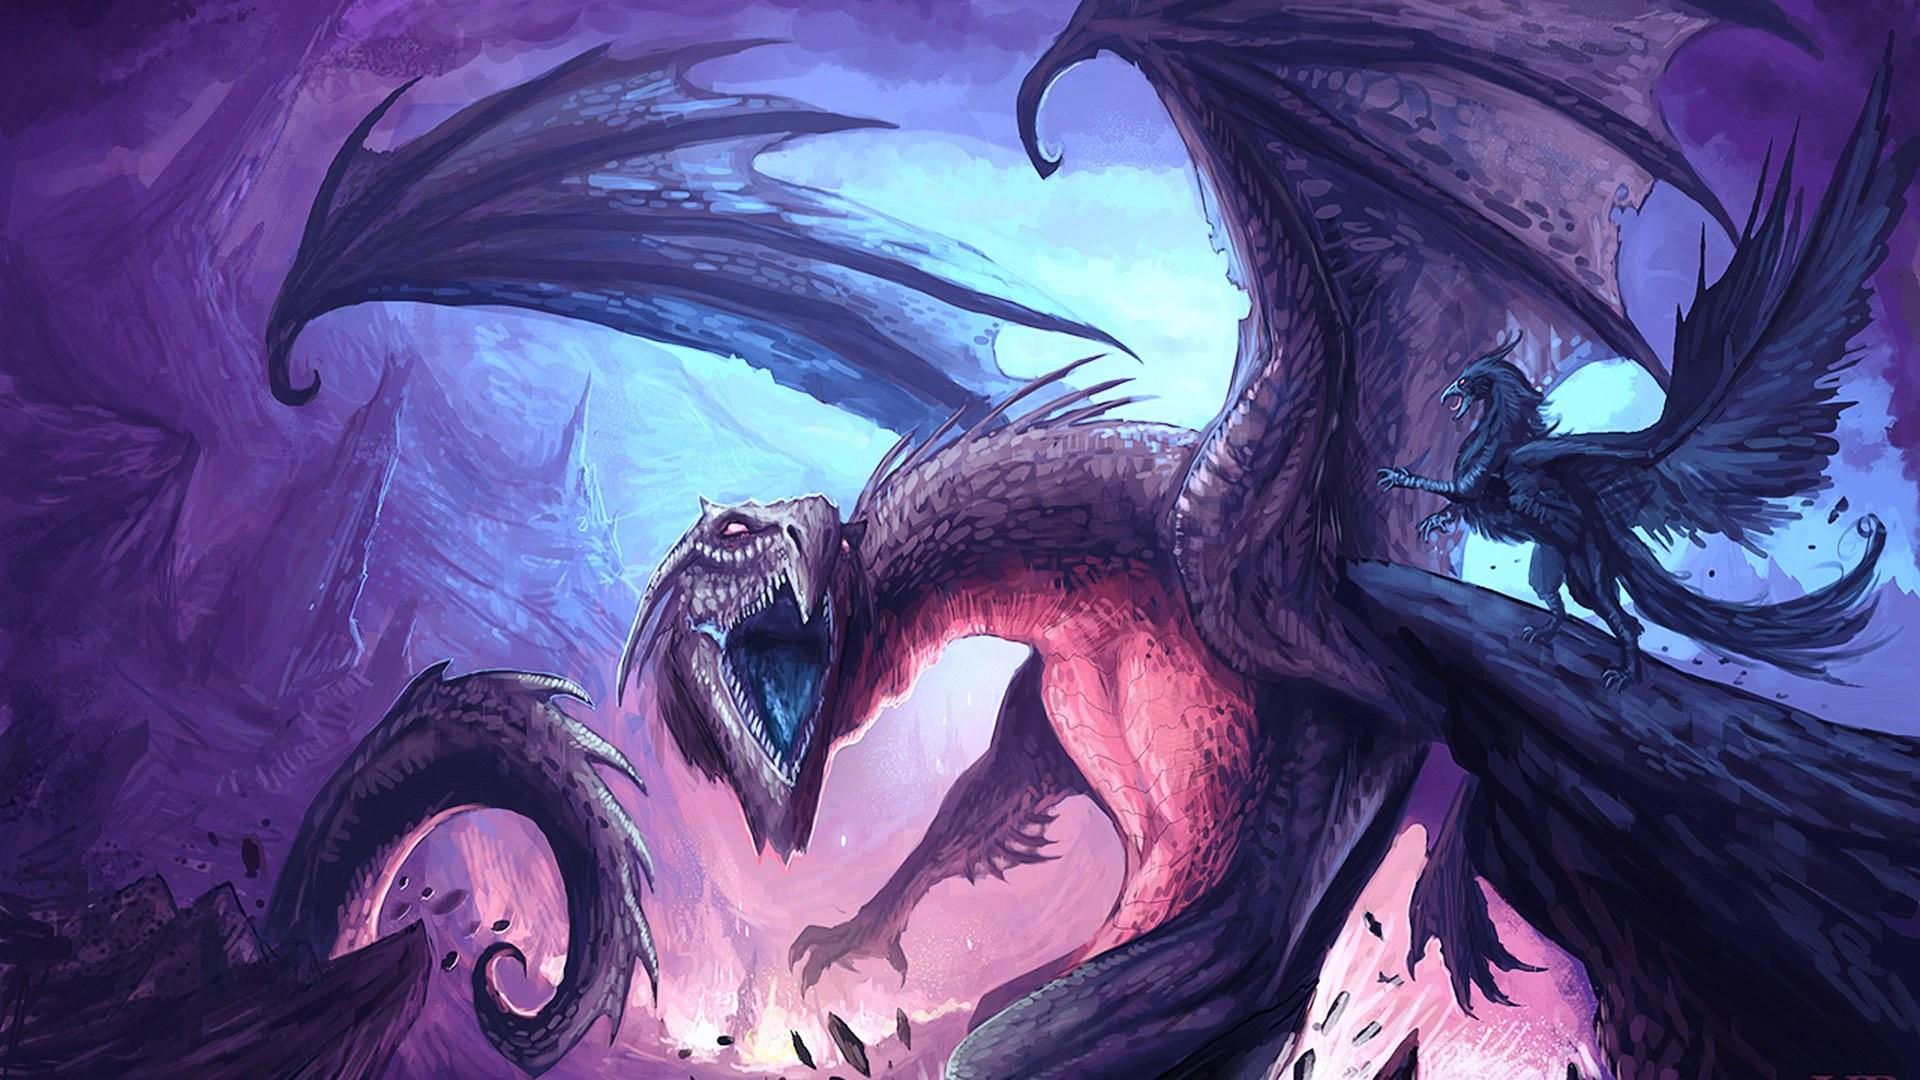 Res: 1920x1080, fantasy dragon wallpaper background